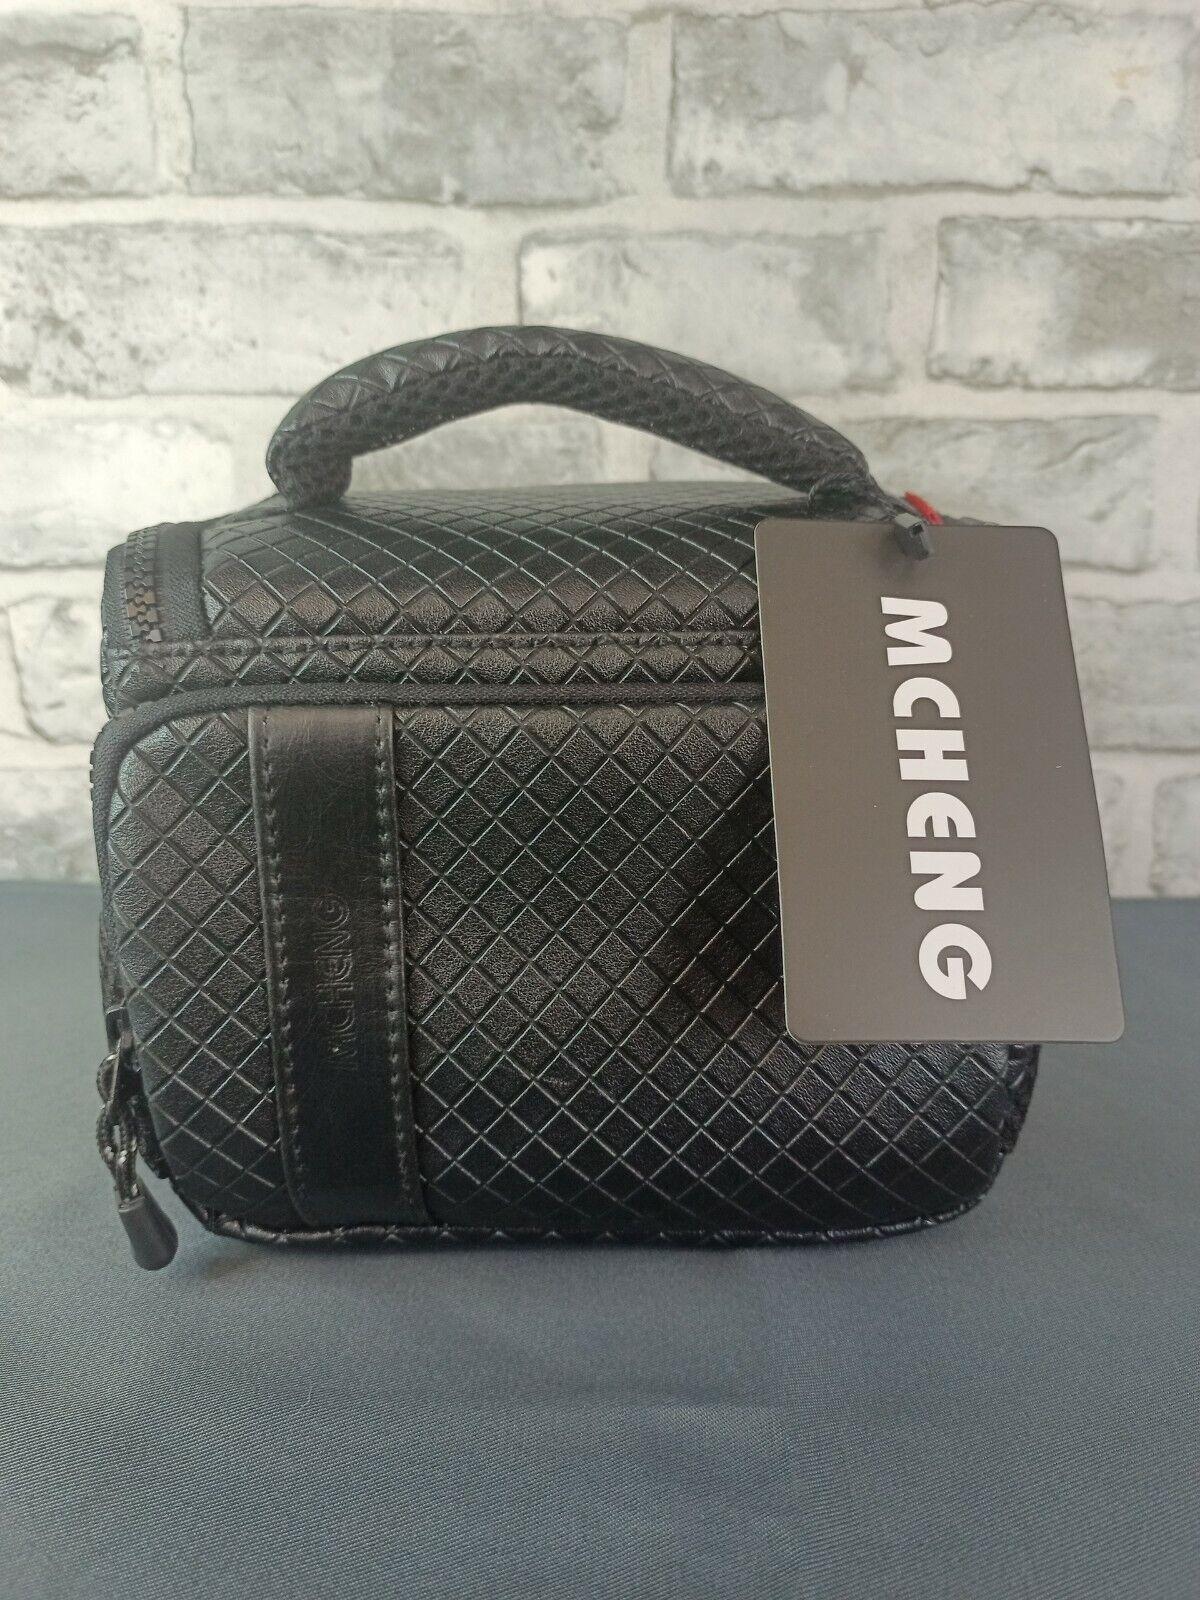 MCHENG Waterproof Camera Case Portable Shoulder Camera Bag